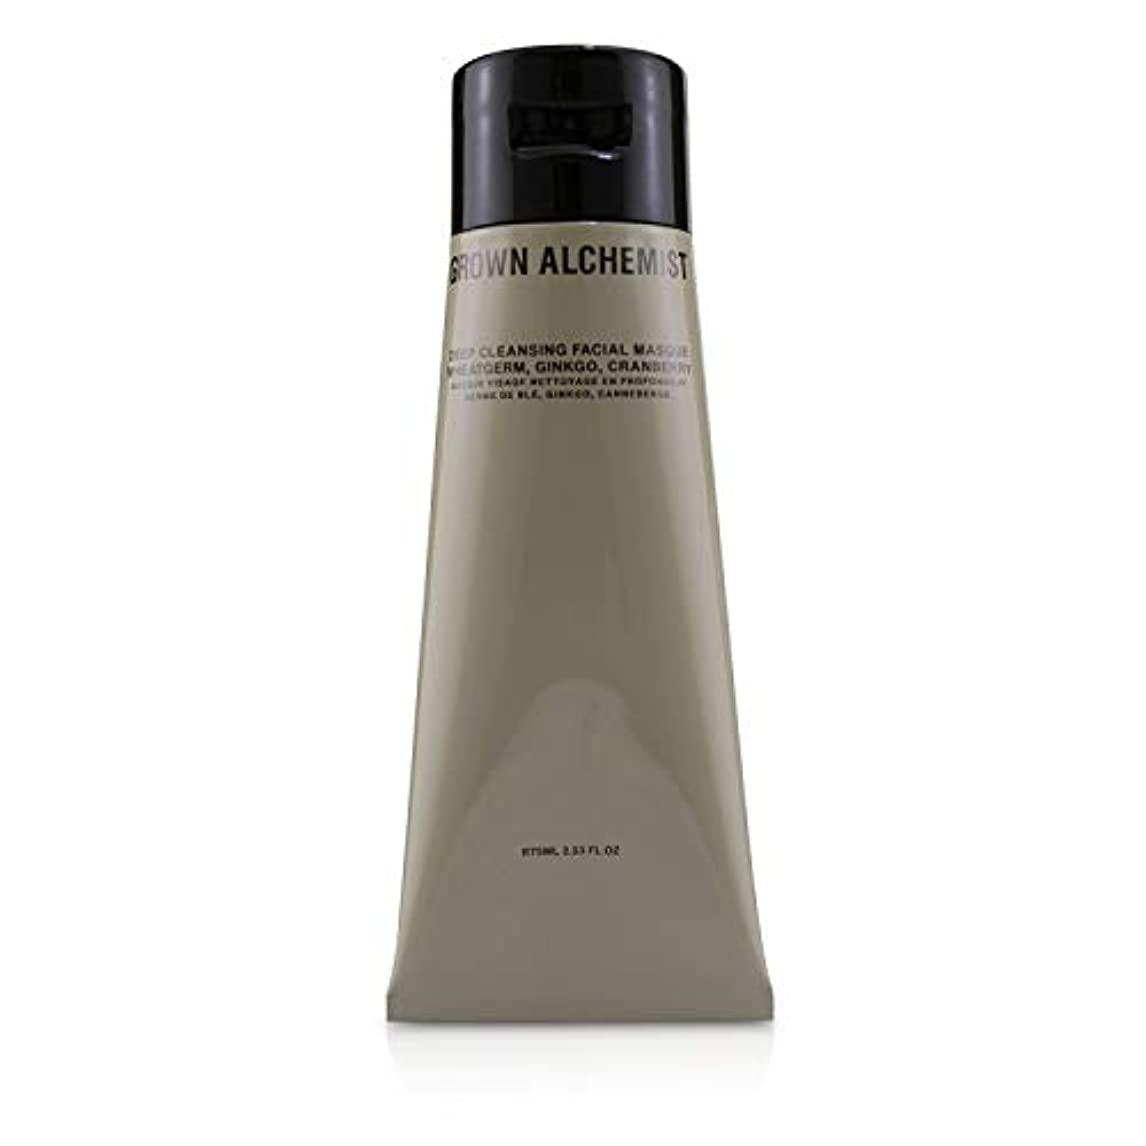 黙認する体操選手防衛Grown Alchemist Deep Cleansing Facial Masque - Wheatgerm, Ginkgo & Cranberry 75ml/2.53oz並行輸入品